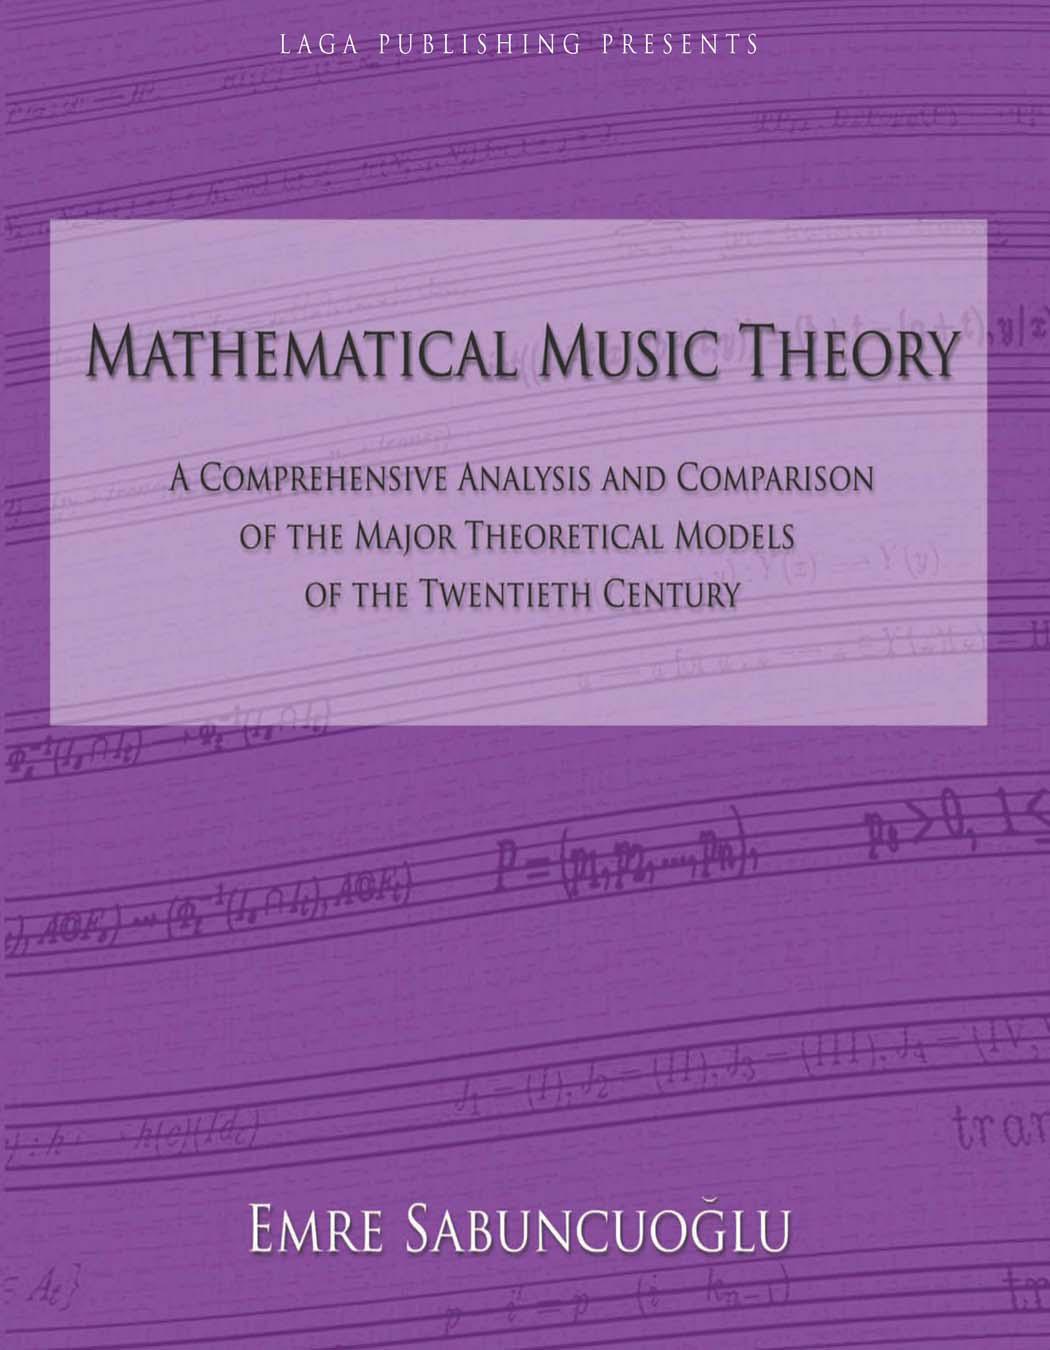 cover-LAGA-Publishing-ES-math-music